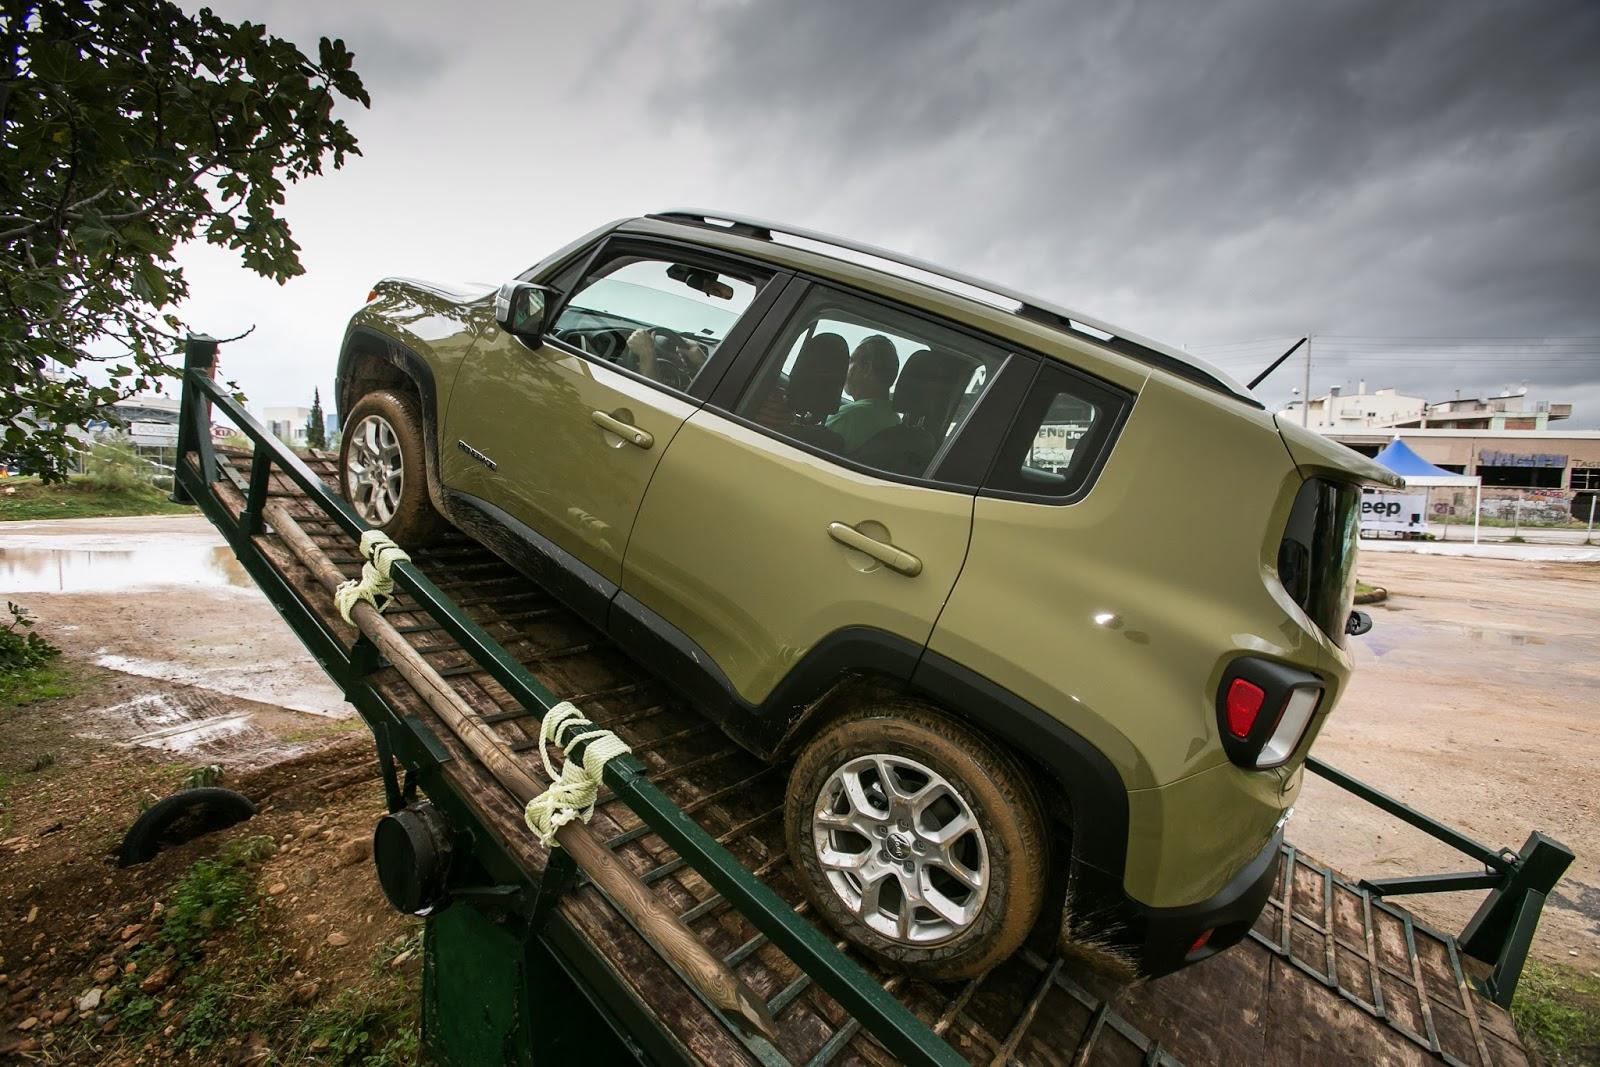 JEEP%2BCAMP GK 0412 Πετάμε ένα Jeep Renegade σε λάσπες, πέτρες, άμμο, λίμνες. Θα τα καταφέρει; Jeep, Jeep Renegade, Renegade, SUV, TEST, zblog, ΔΟΚΙΜΕΣ